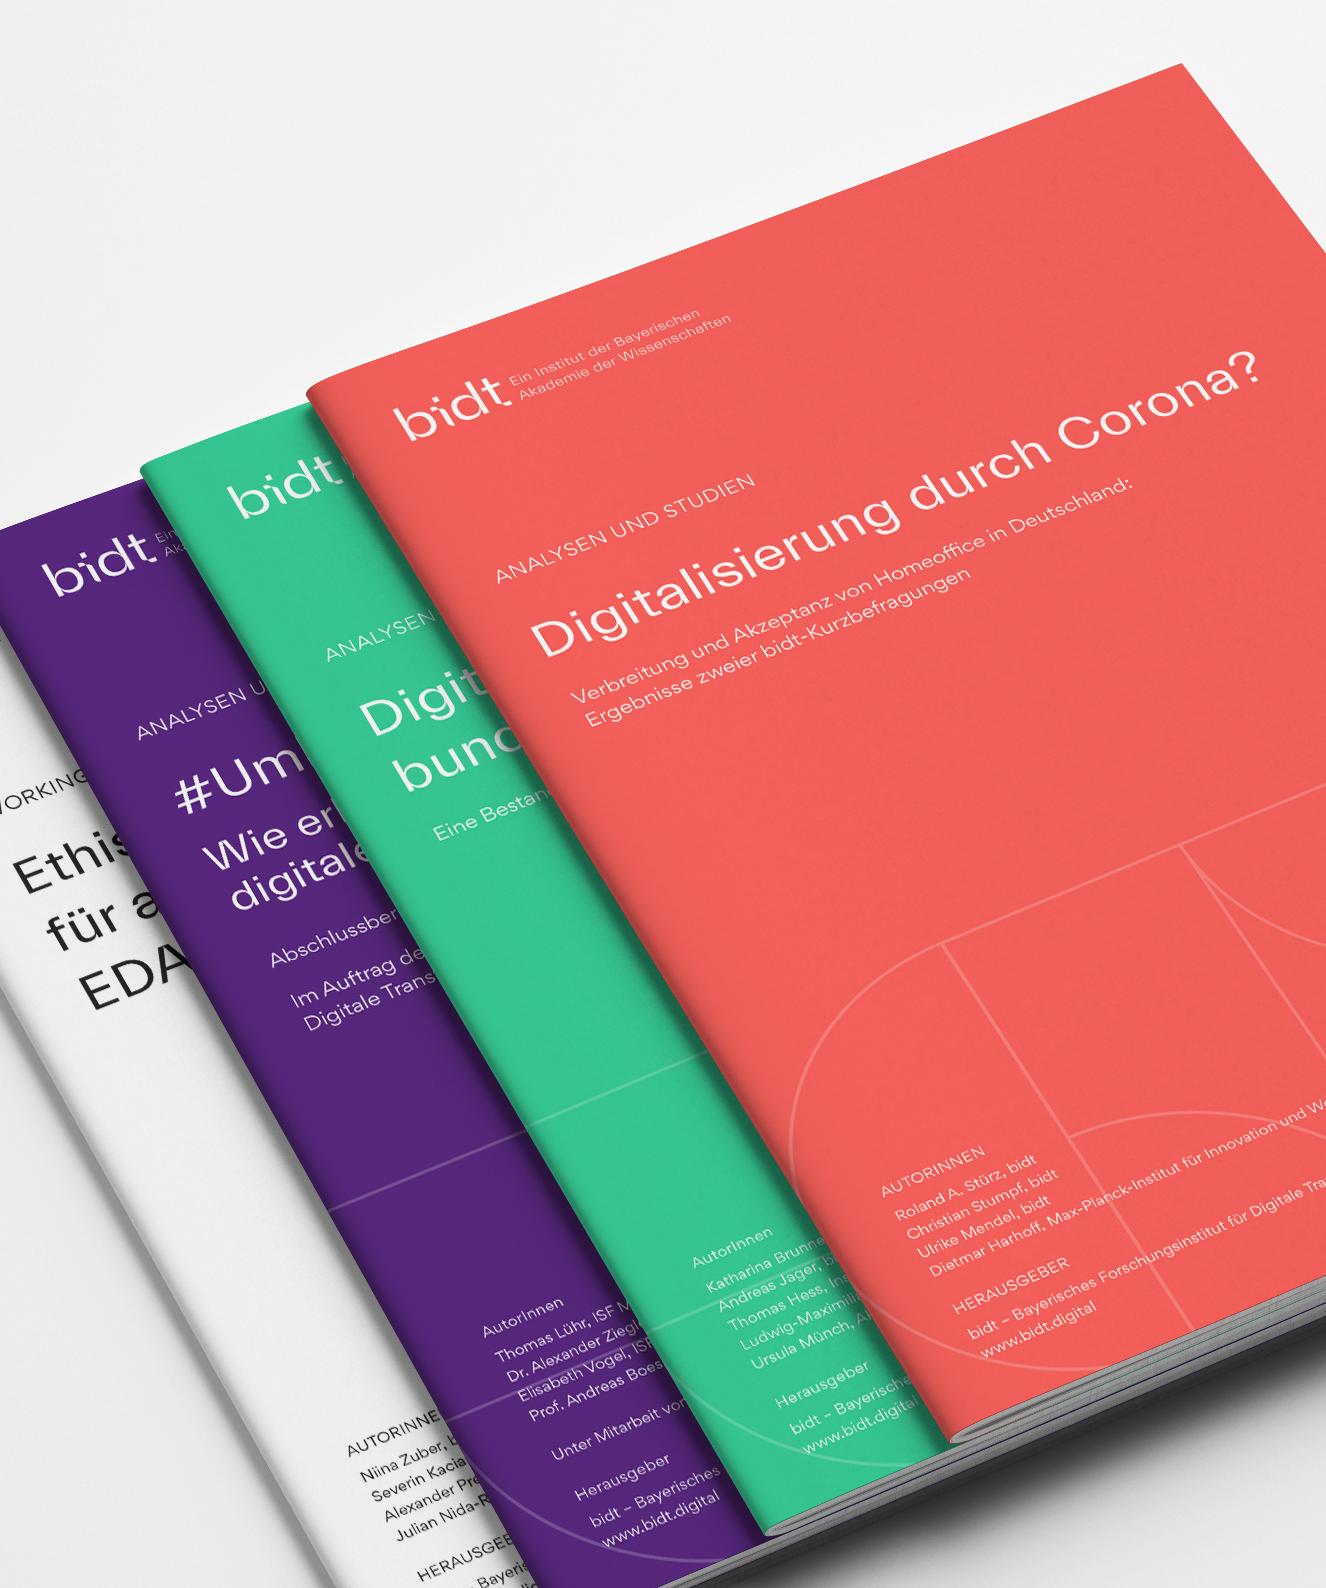 bidt-Publikationen-4-Mockup-hochkant